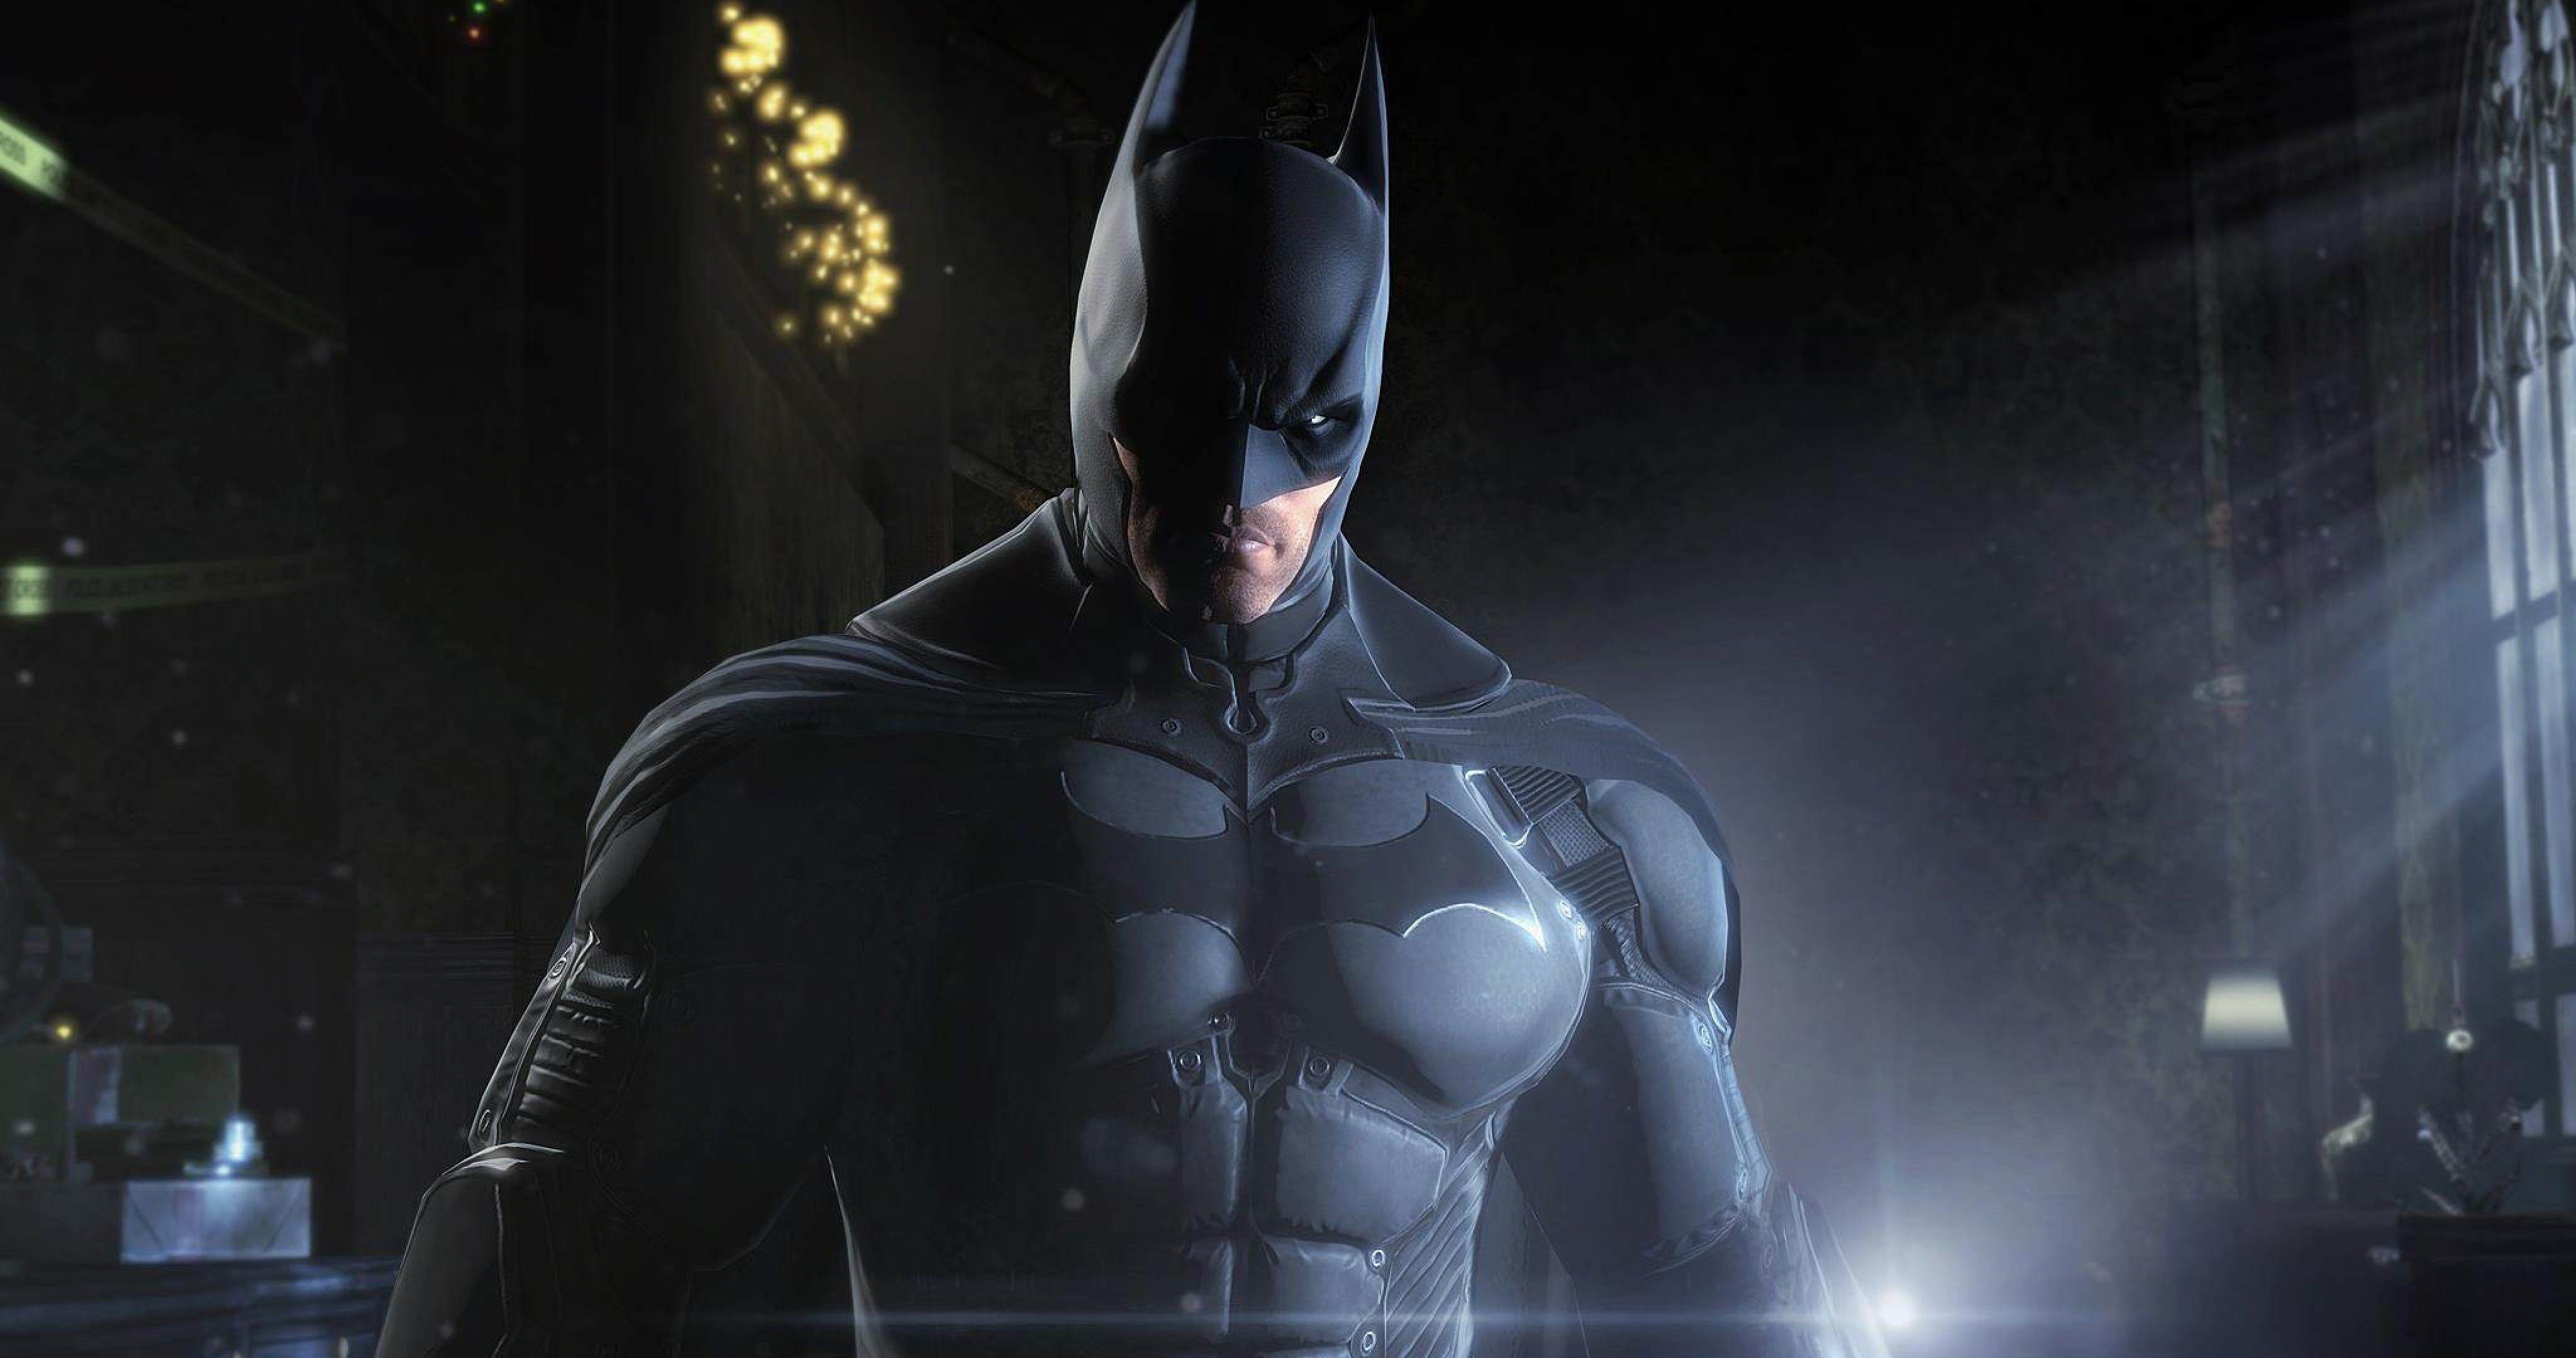 Batman Arkham Origins Hd 4k Ultra Hd Wallpaper Batman Arkham City Batman Games Batman Arkham Origins